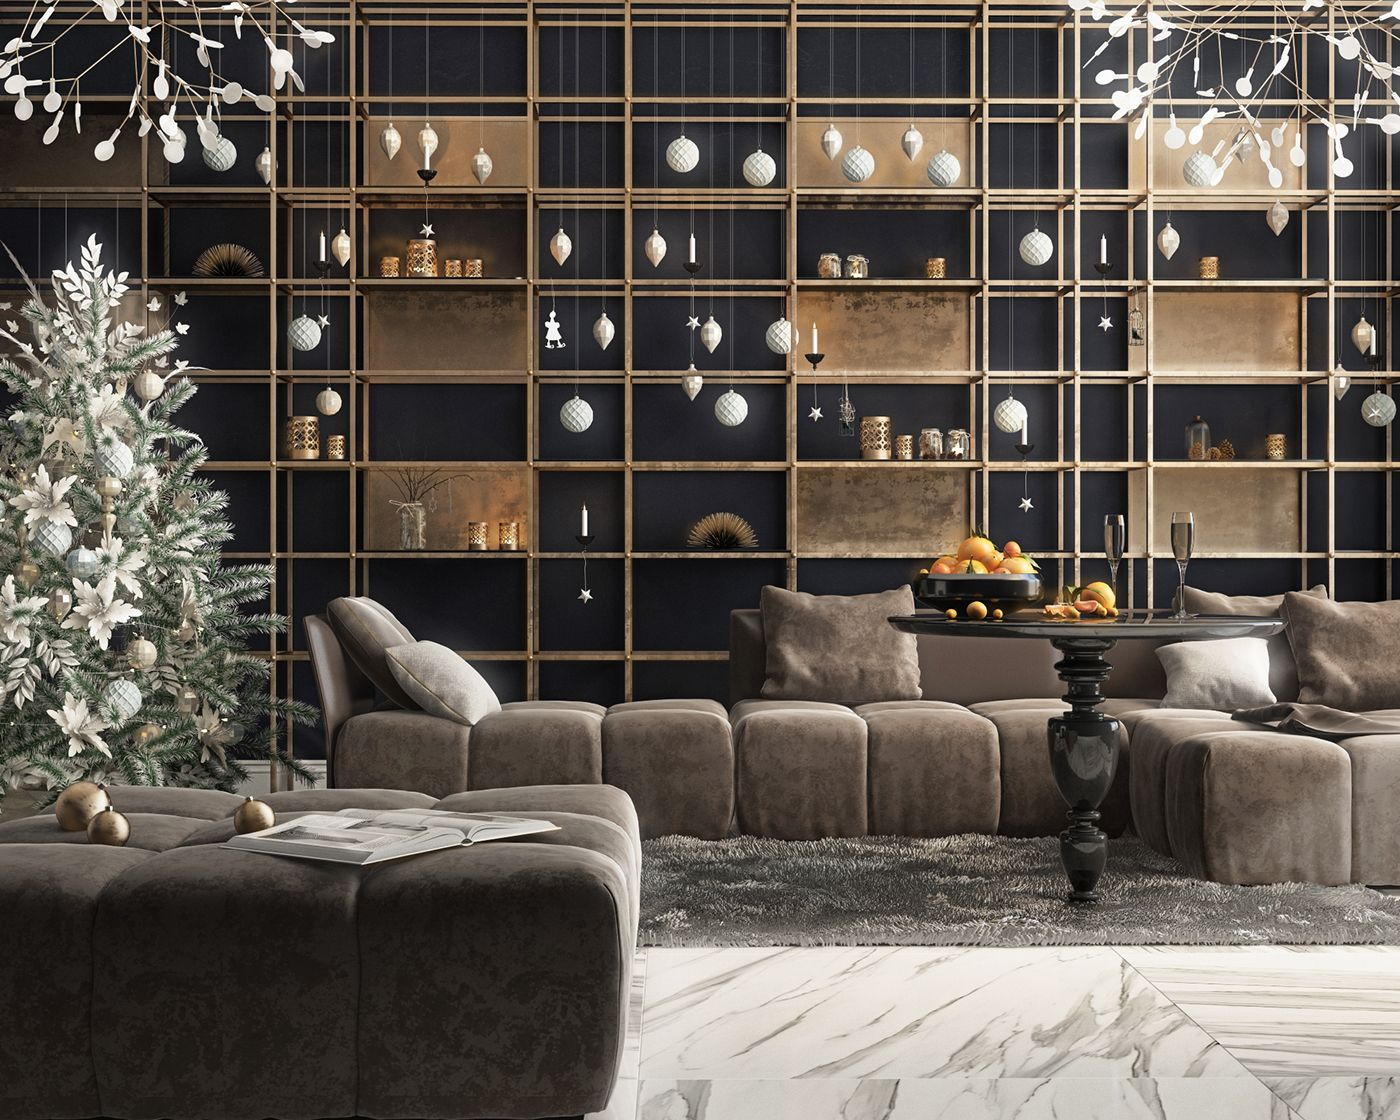 New year interior ⭐️ on Behance